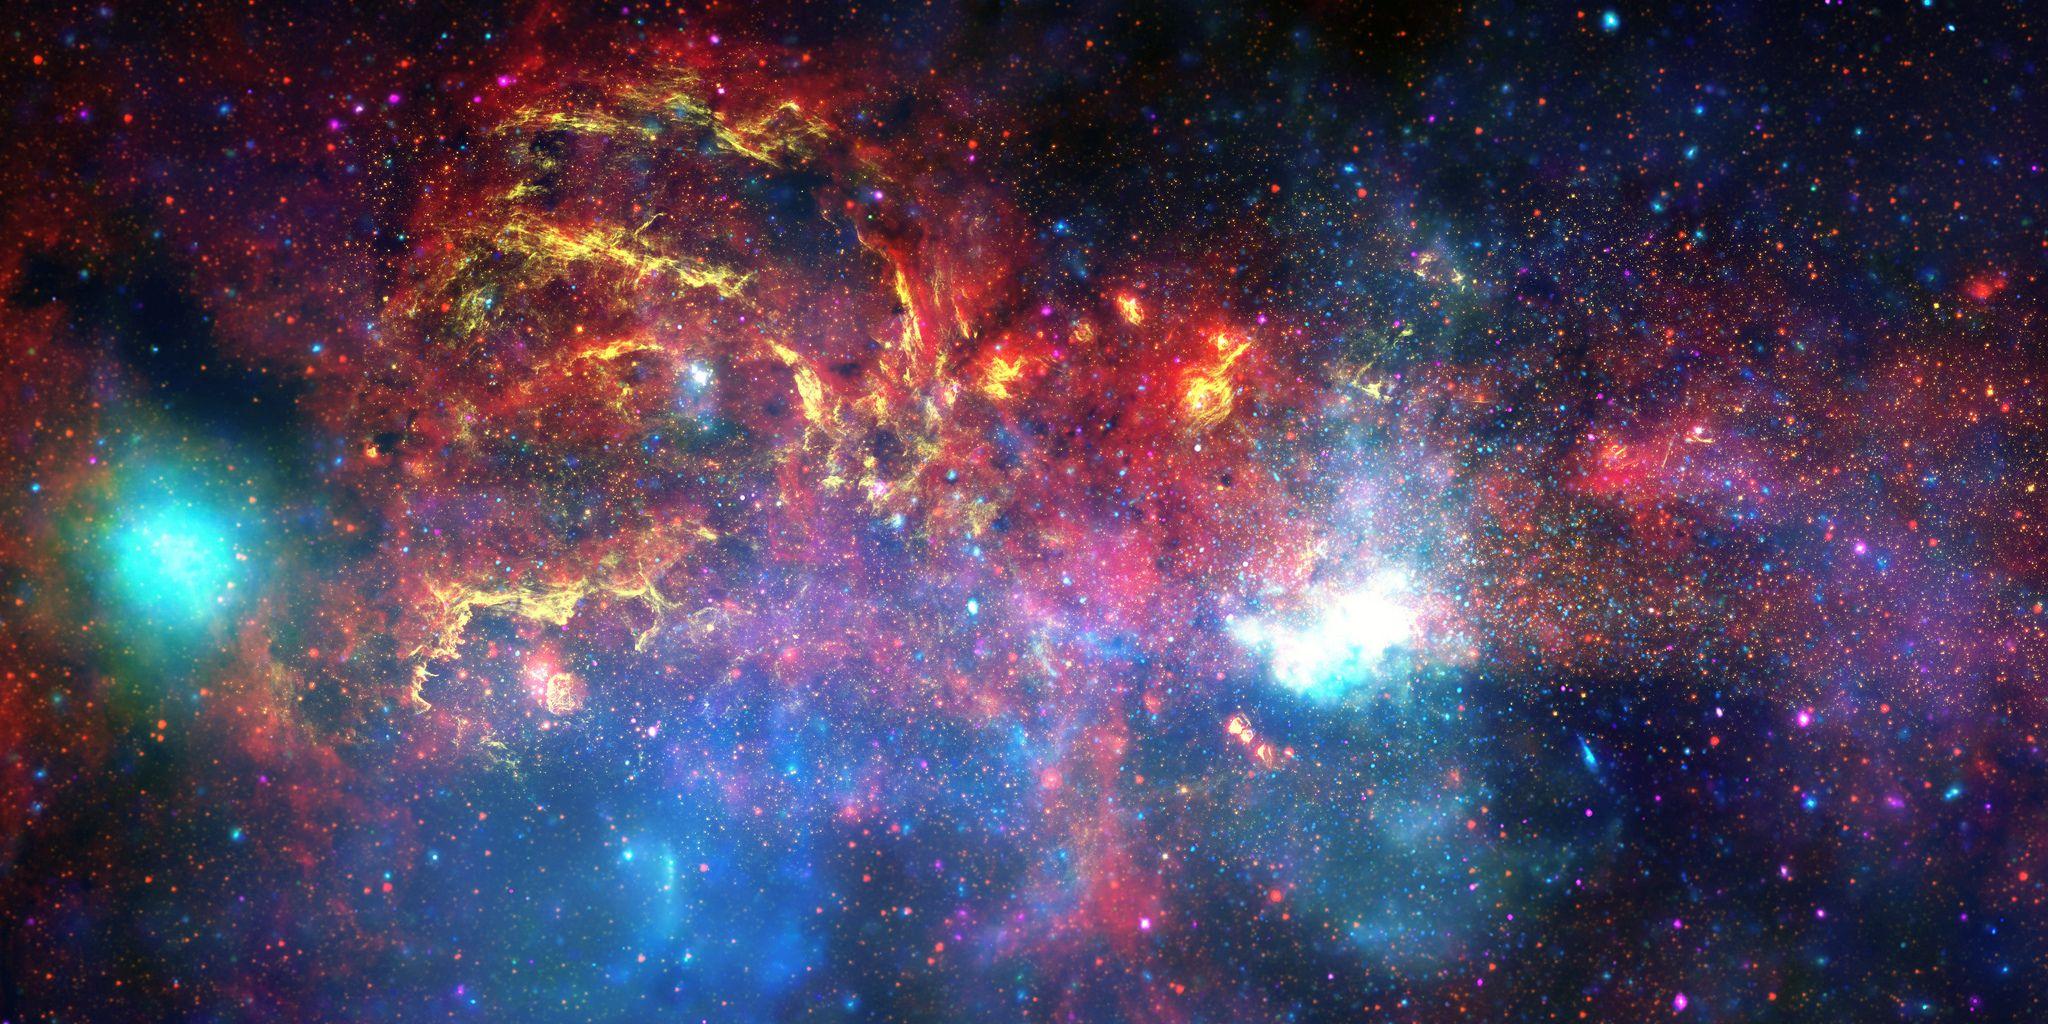 16_1_Milky Way